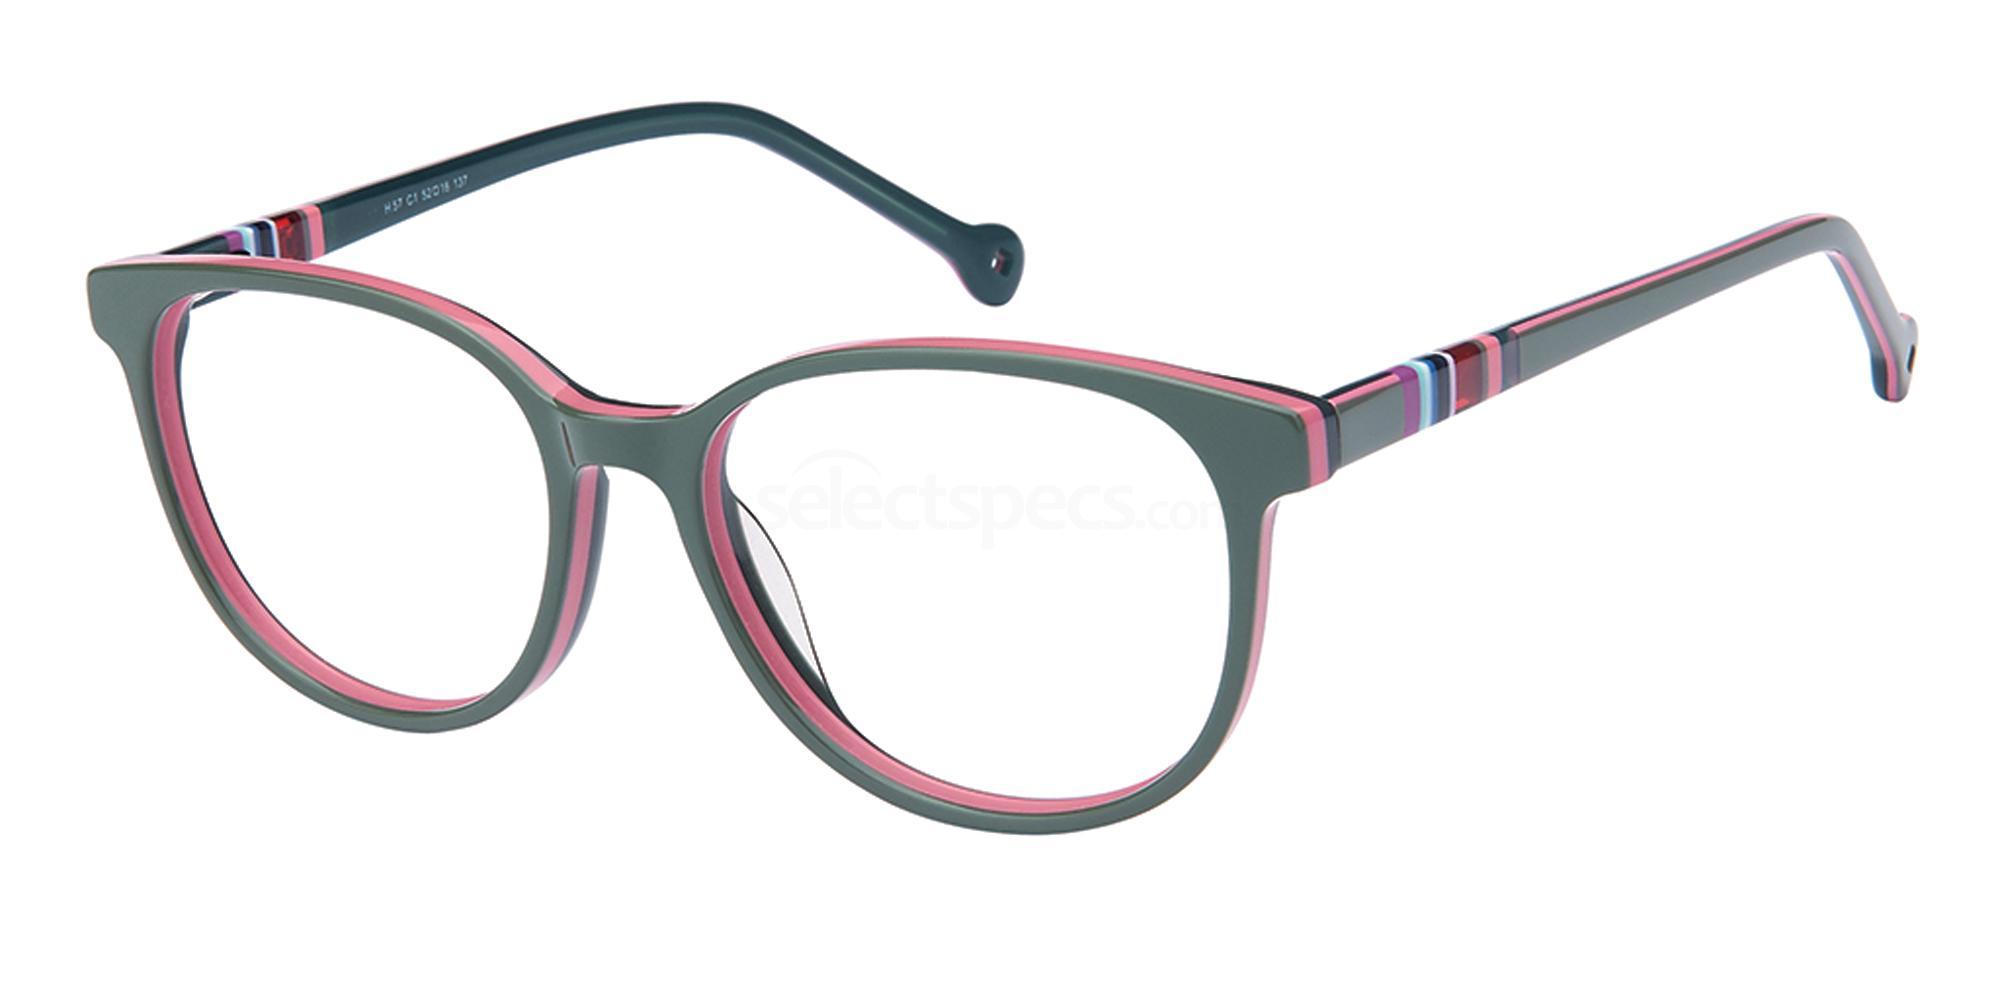 C1 H057 Glasses, Halstrom